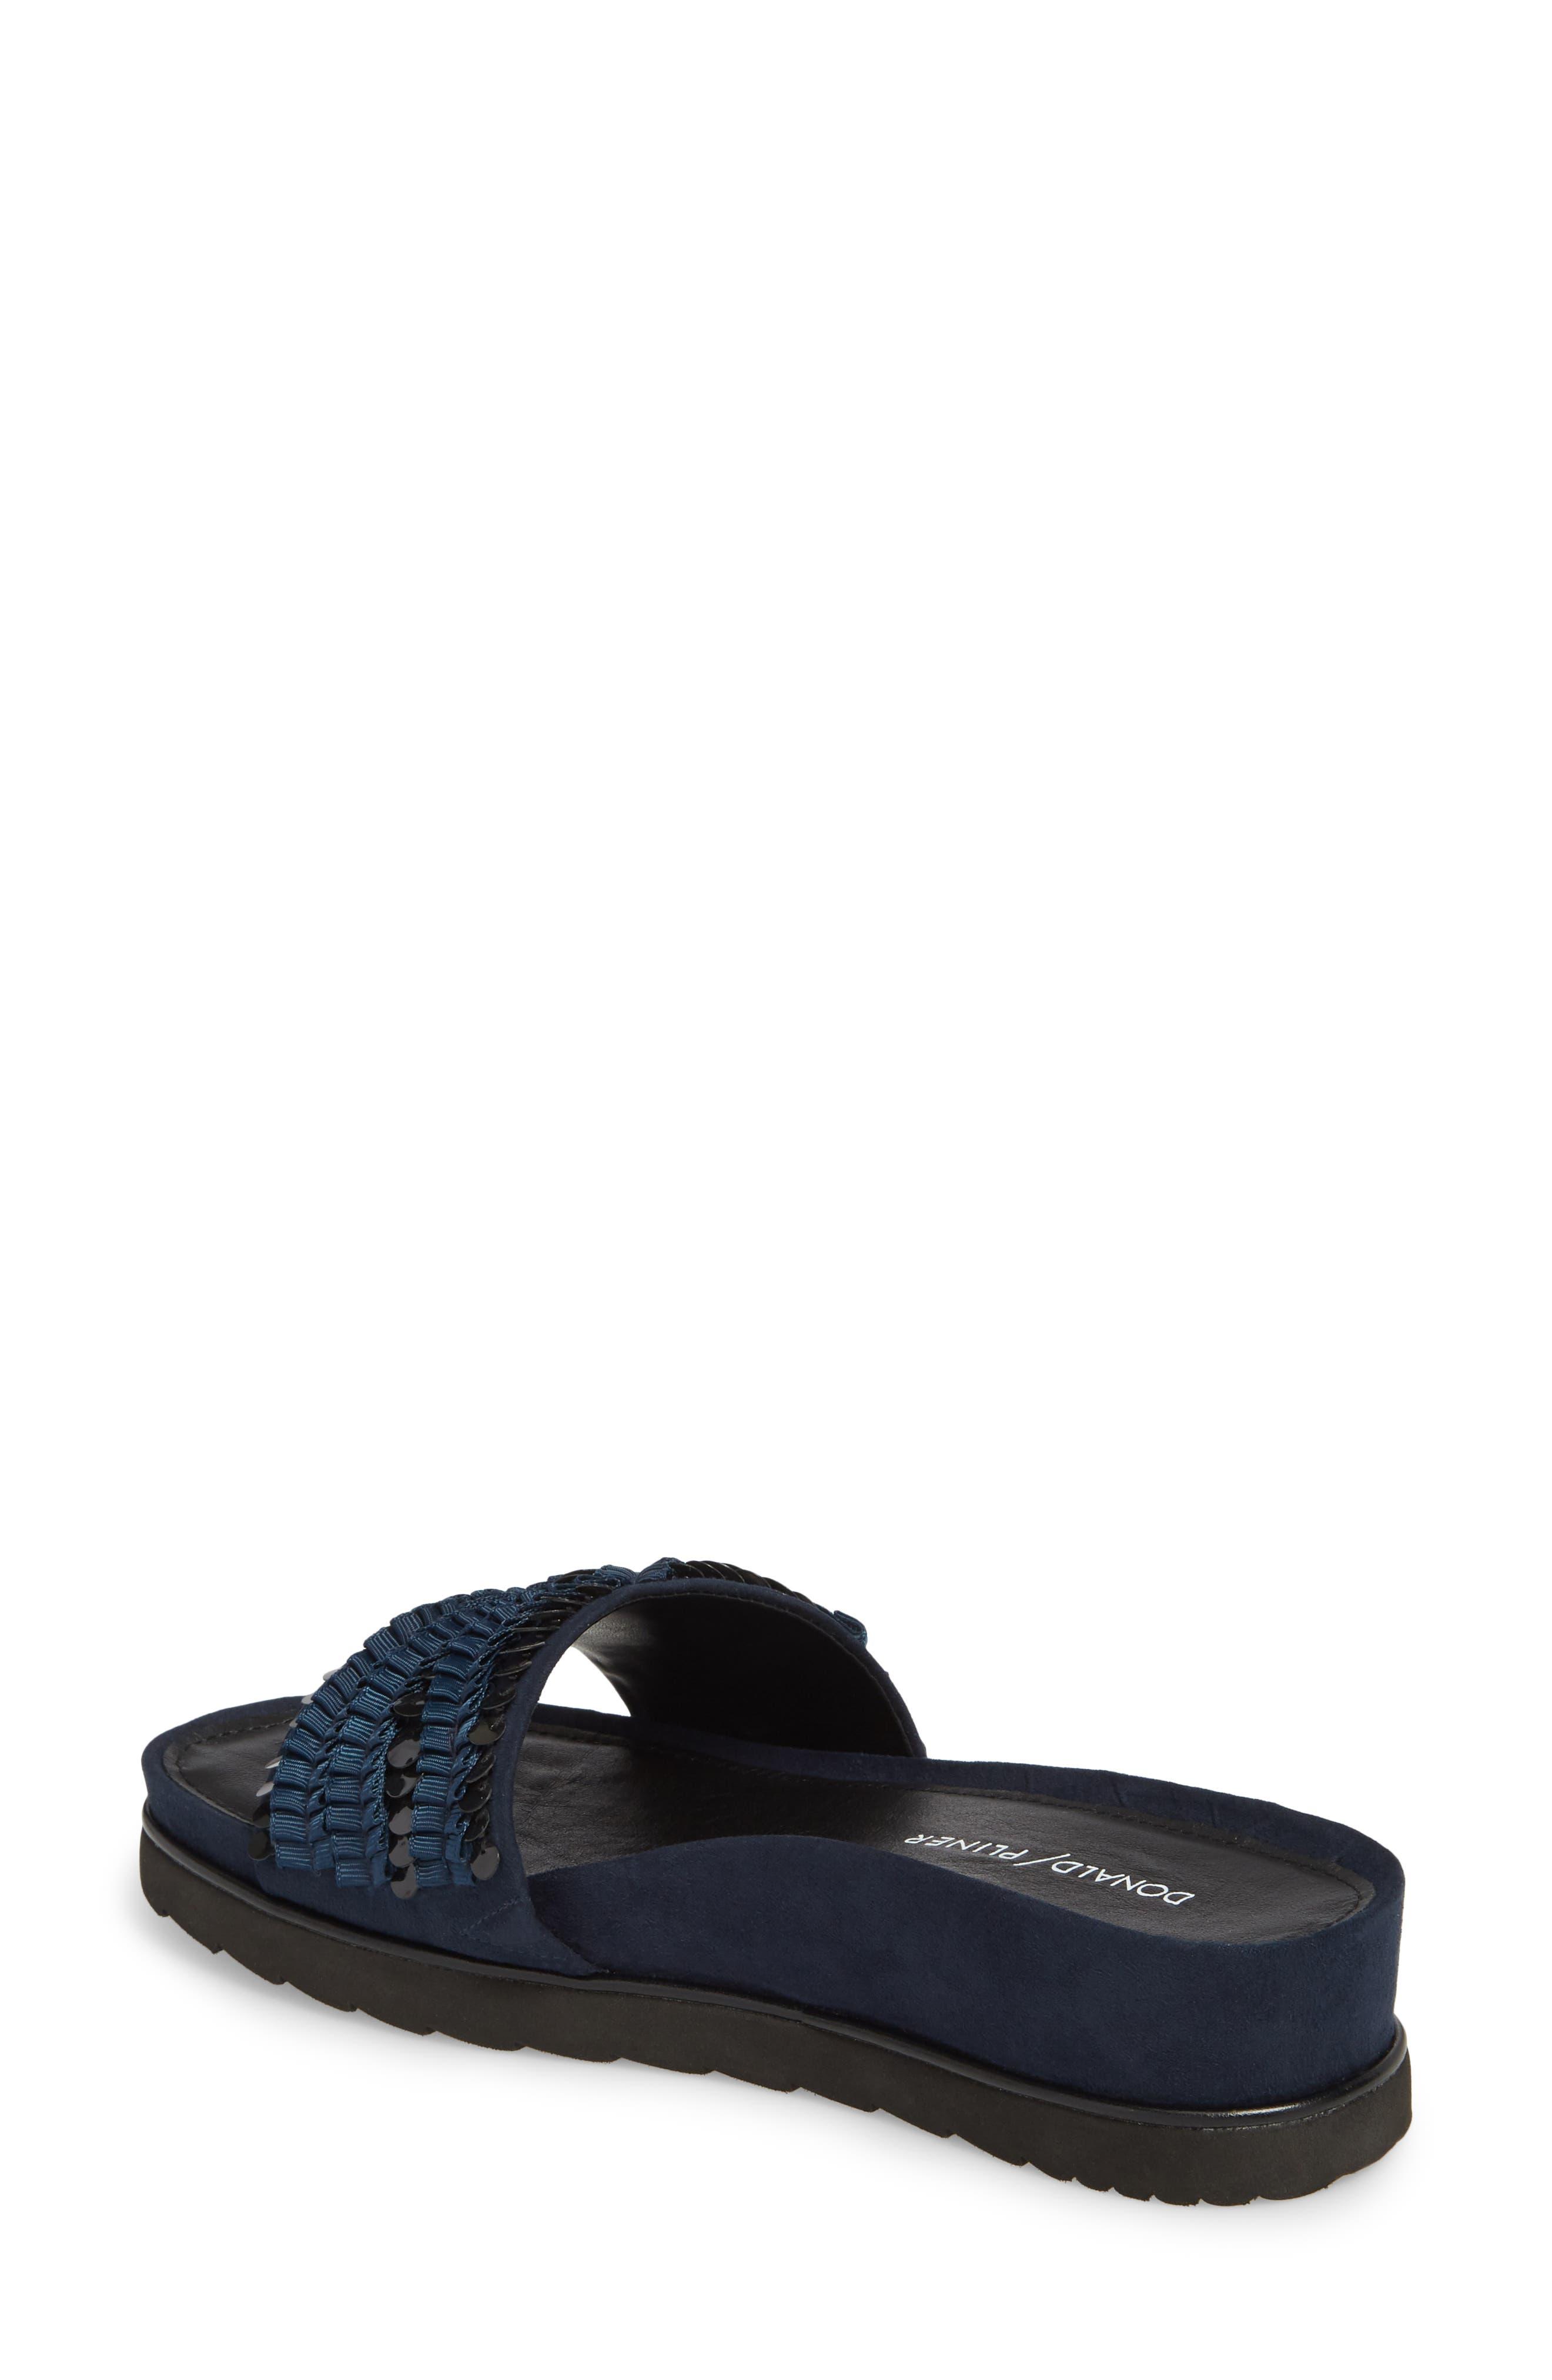 Cava Slide Sandal,                             Alternate thumbnail 2, color,                             NAVY SUEDE